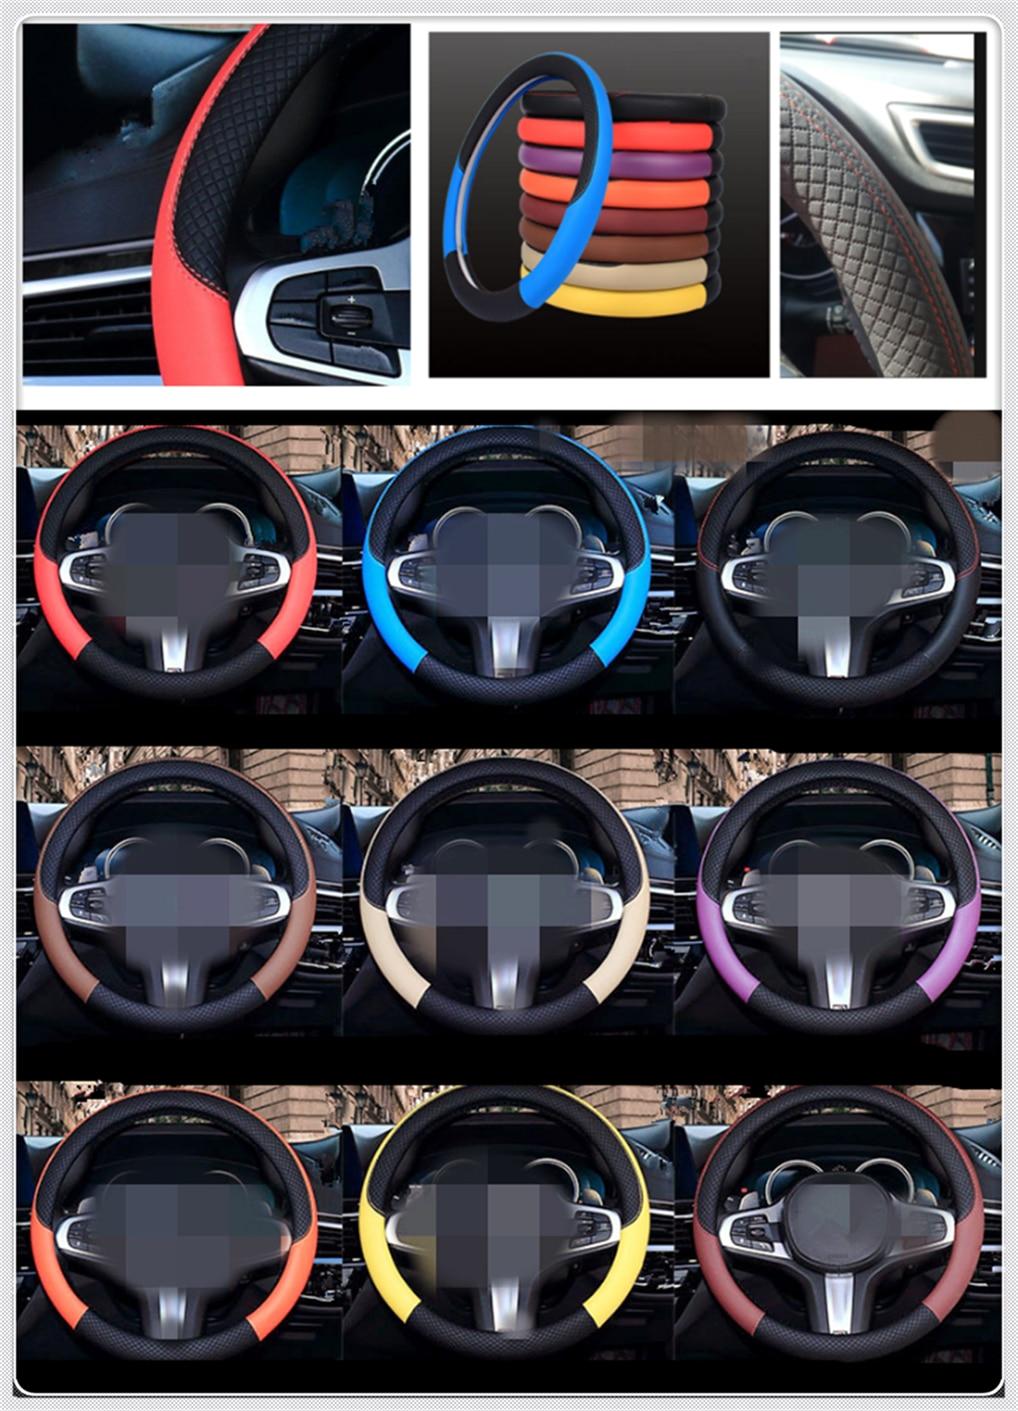 Auto partes volante cubierta 38 cm o 15 pulgadas cuero tejido para Kia KV7 POP VG Soulster No3 Magentis Borrego